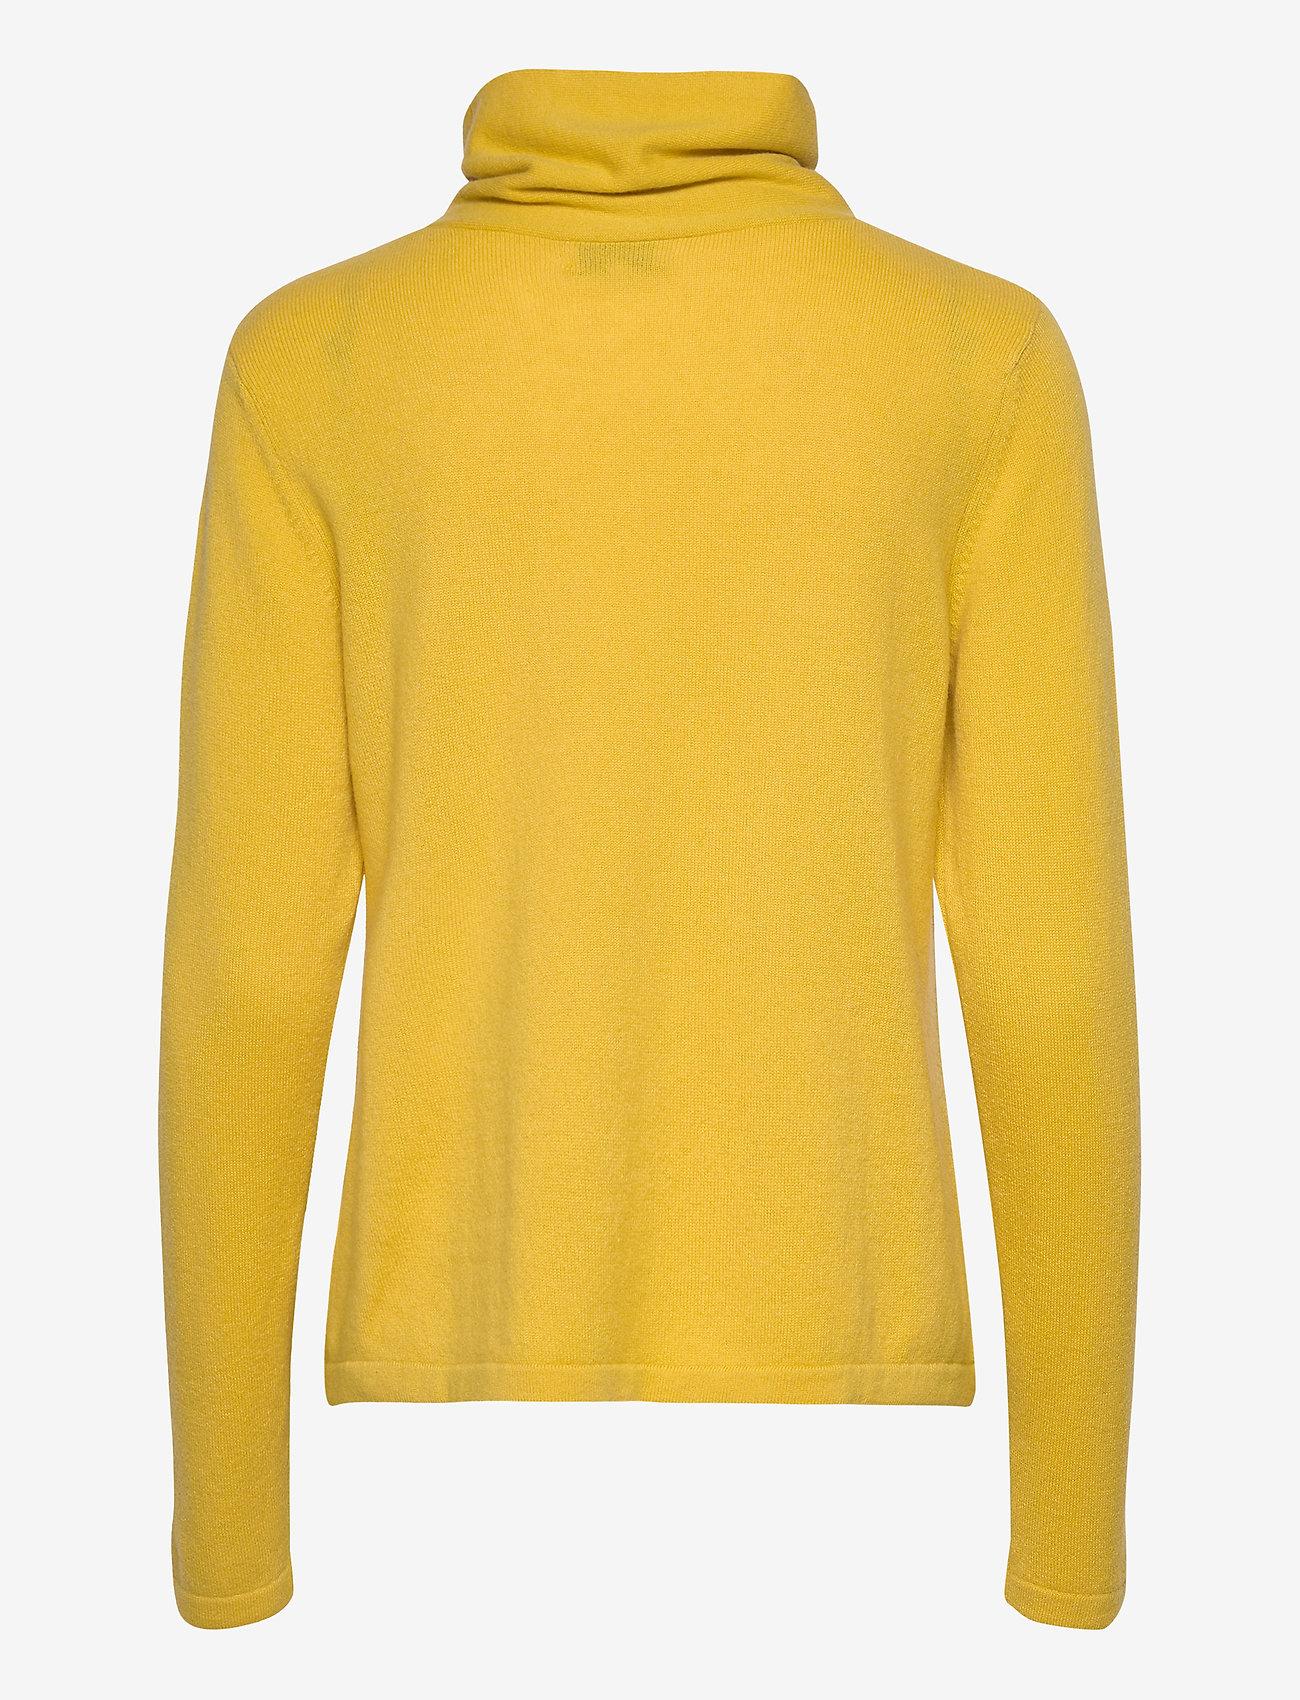 Fold Neck Sweater (Yellow) - Davida Cashmere 1Uwqxg